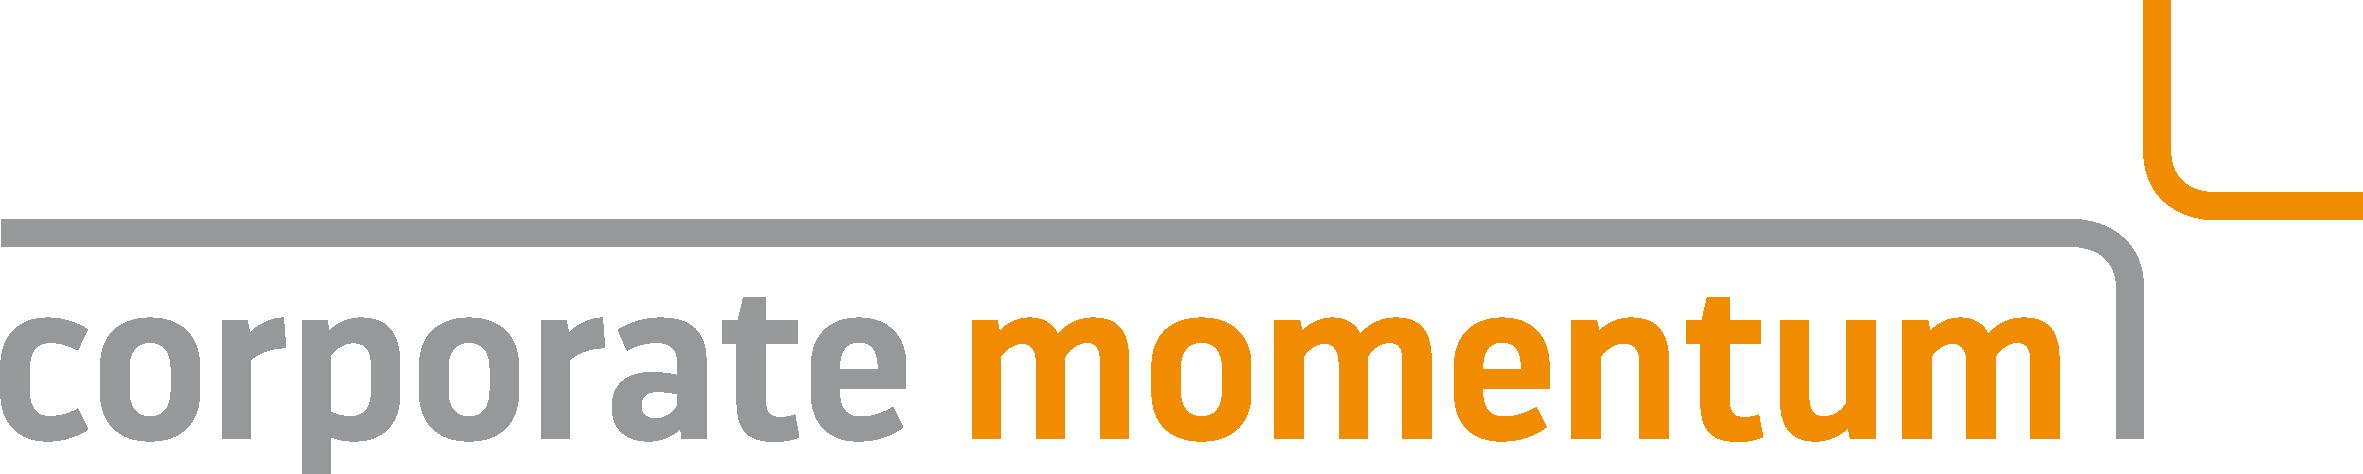 logo-corporate-momentum-rgb